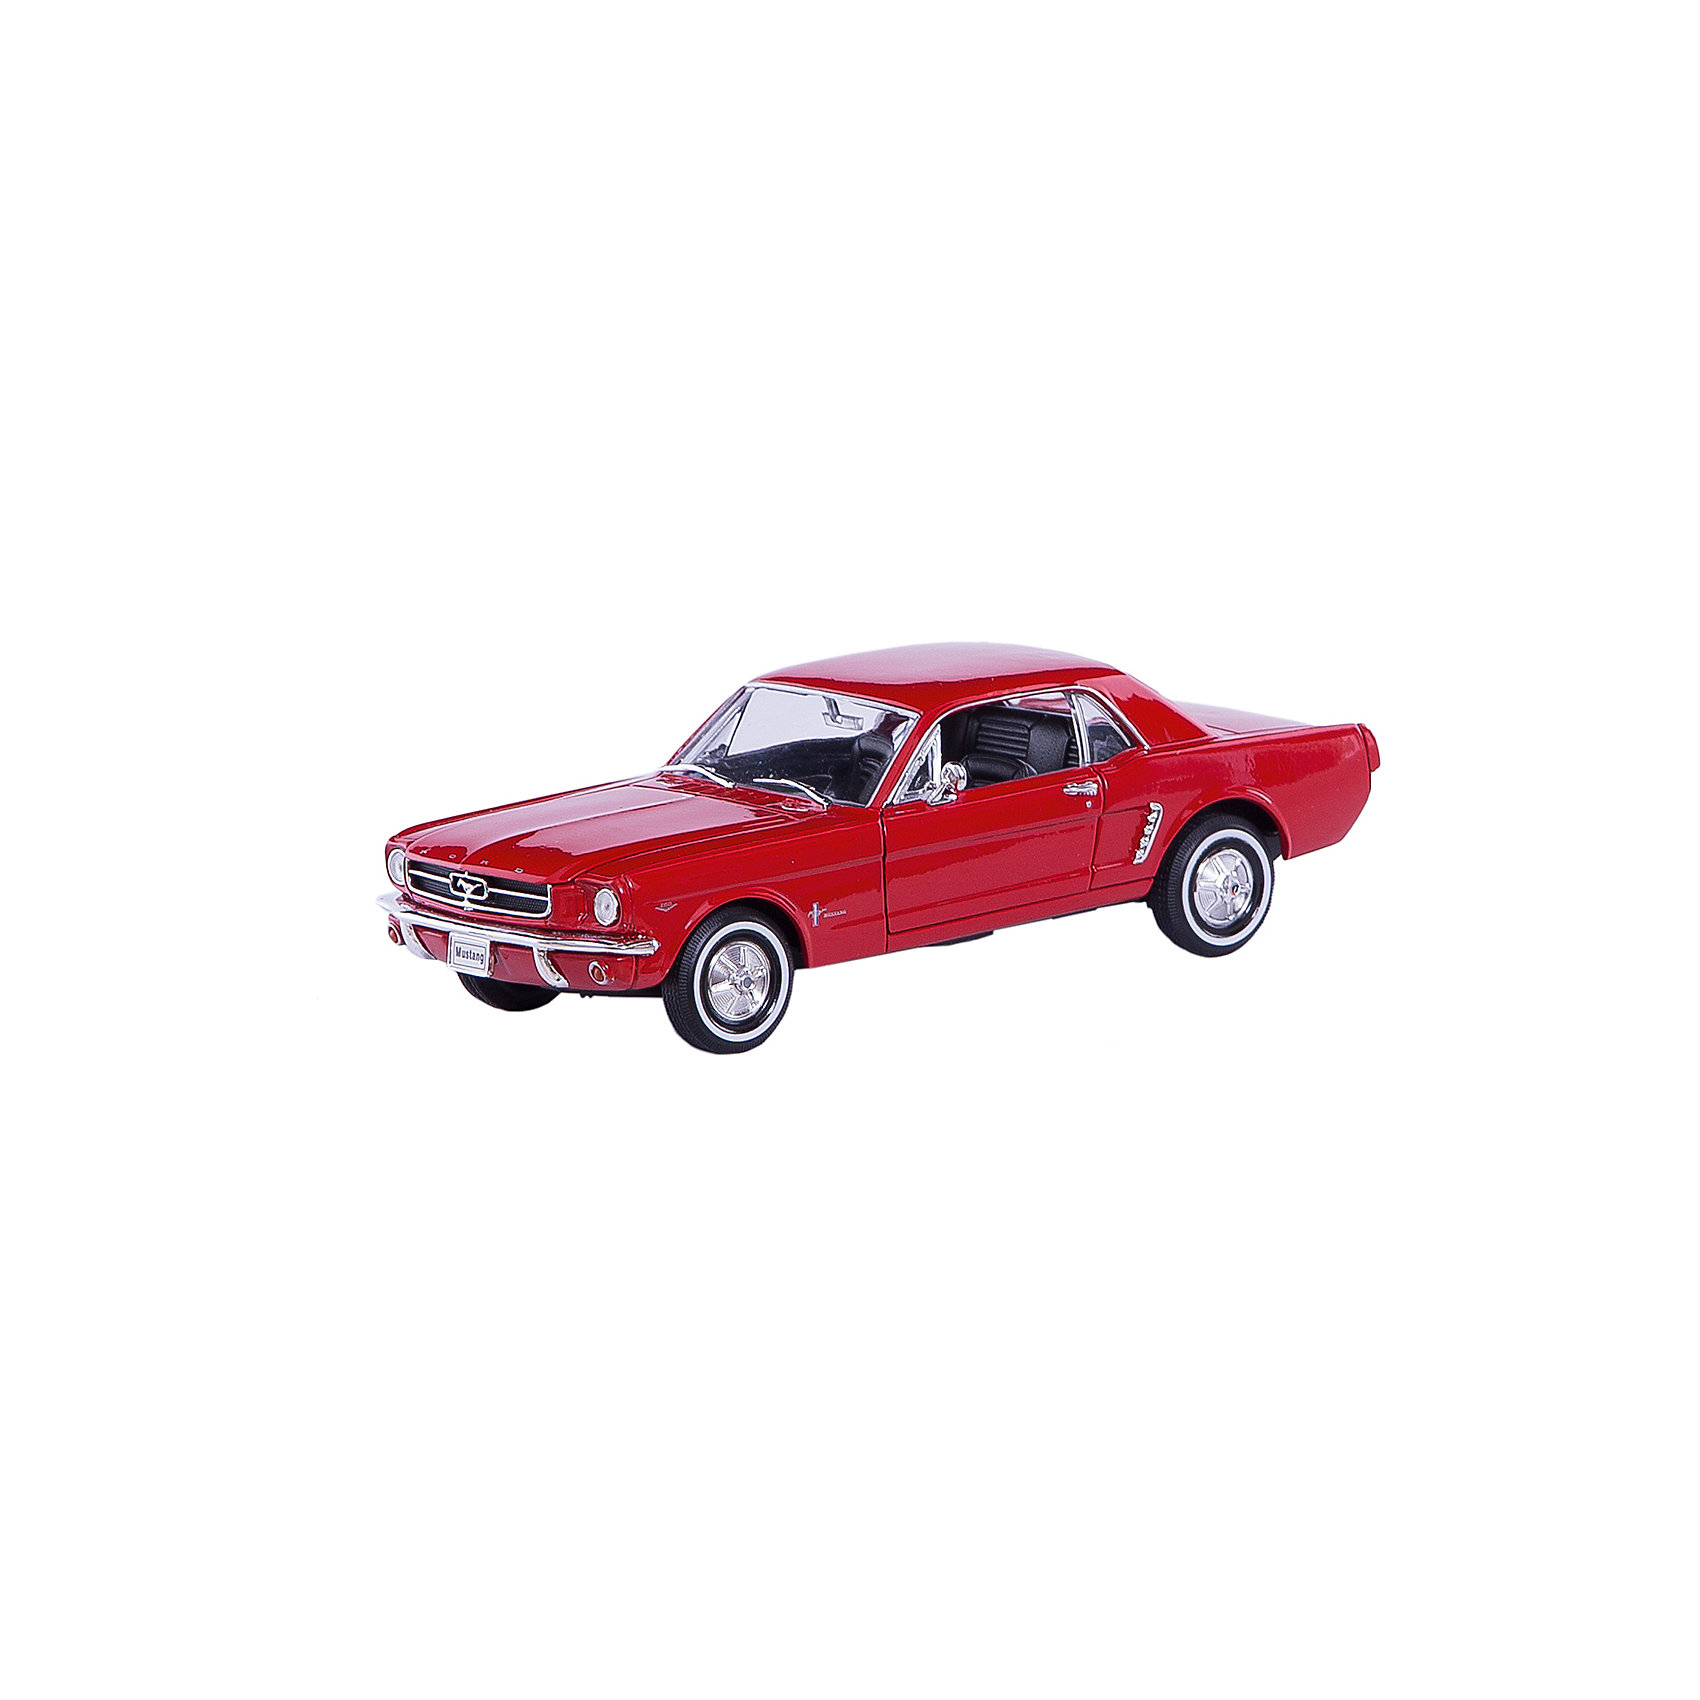 Welly Модель винтажной машины 1:24 Ford Mustang 1964, Welly welly модель машины 1 24 aston martin v12 vantage welly